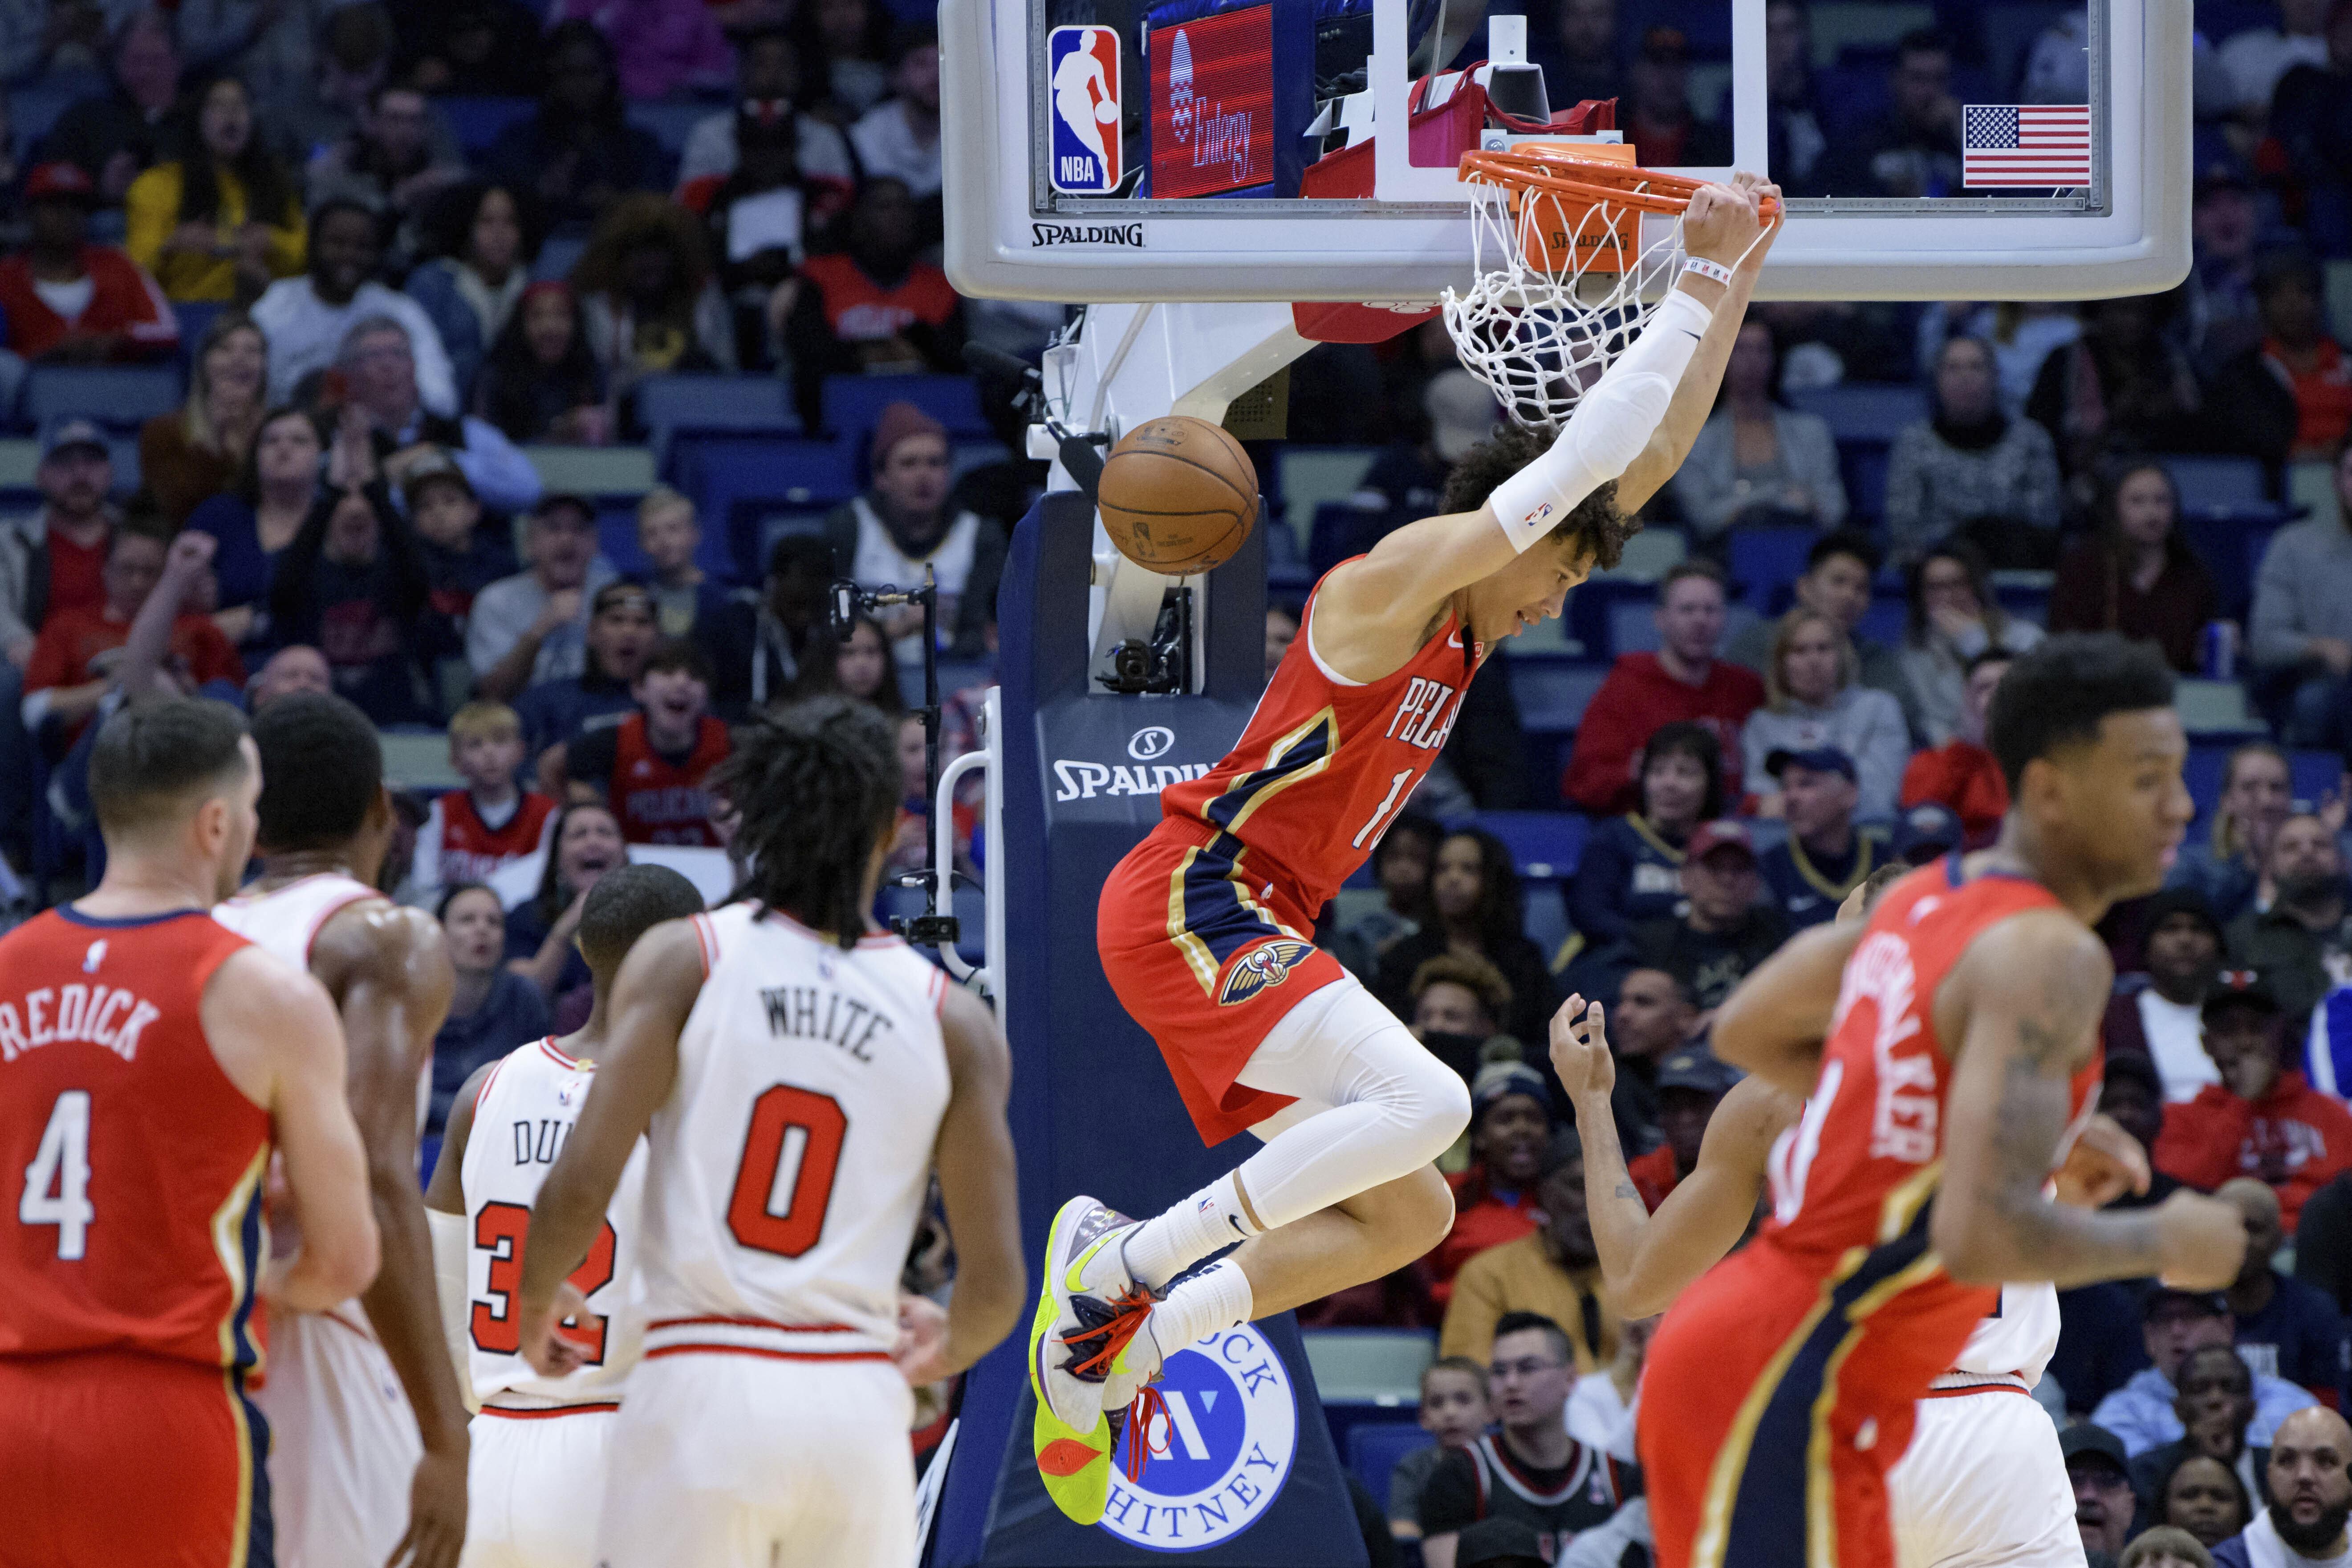 Ingram scores 29 points, Pelicans top Bulls 123-108